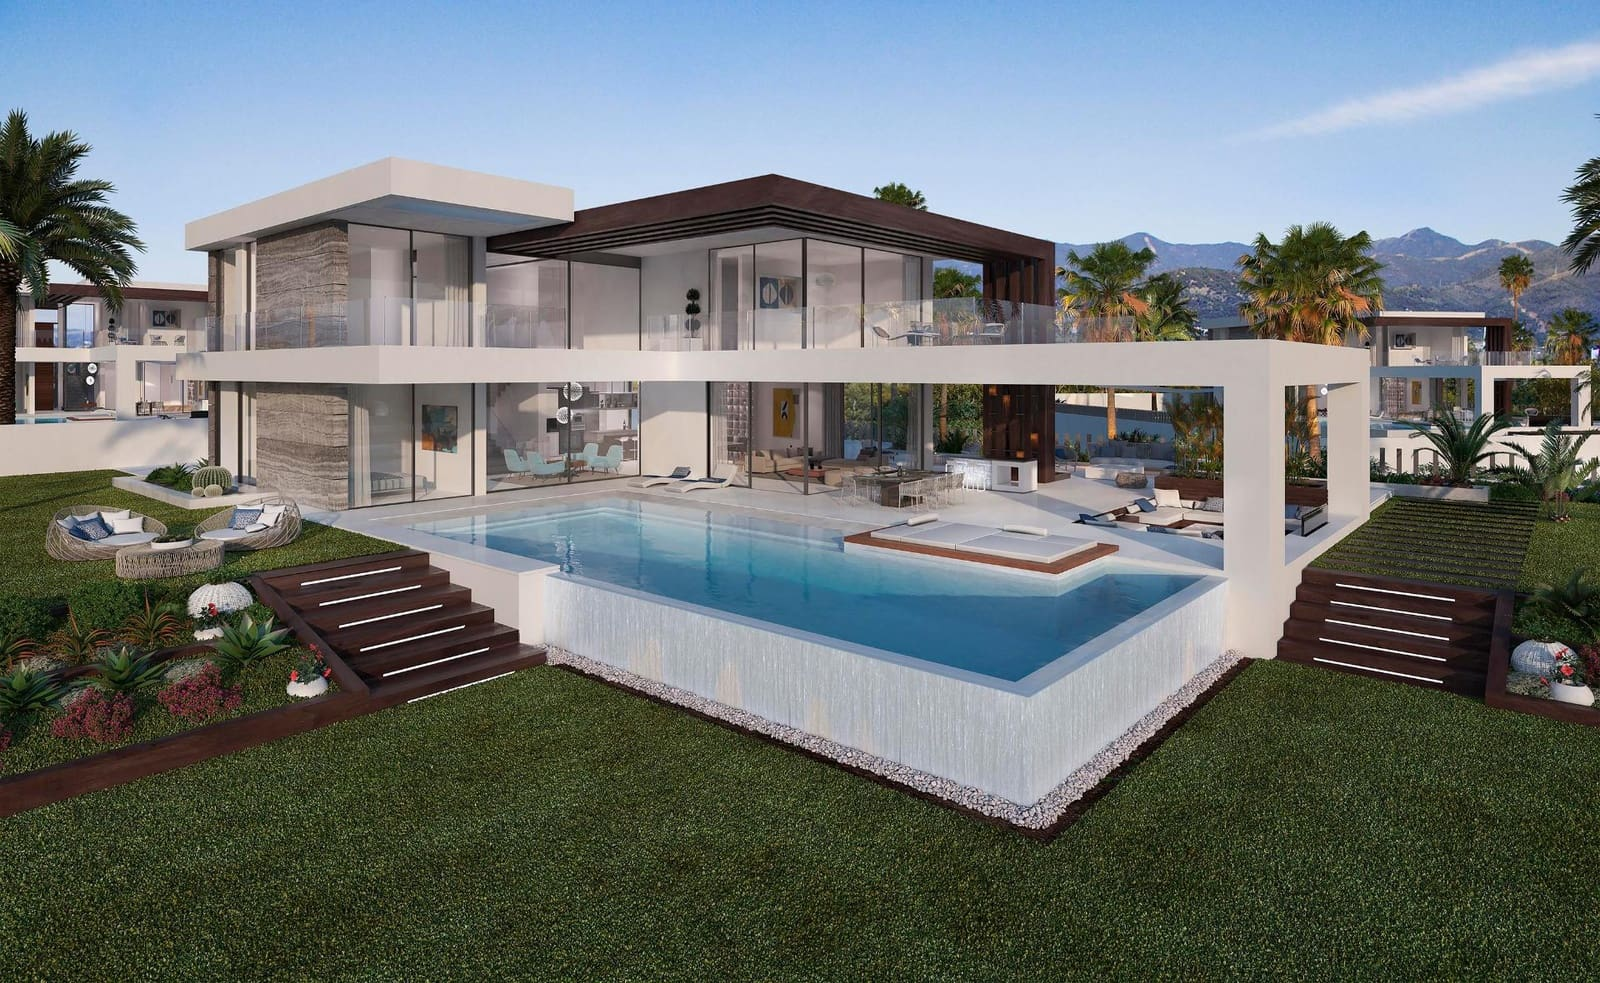 4 bedroom Villa for sale in Estepona - € 1,200,000 (Ref: 5945307)